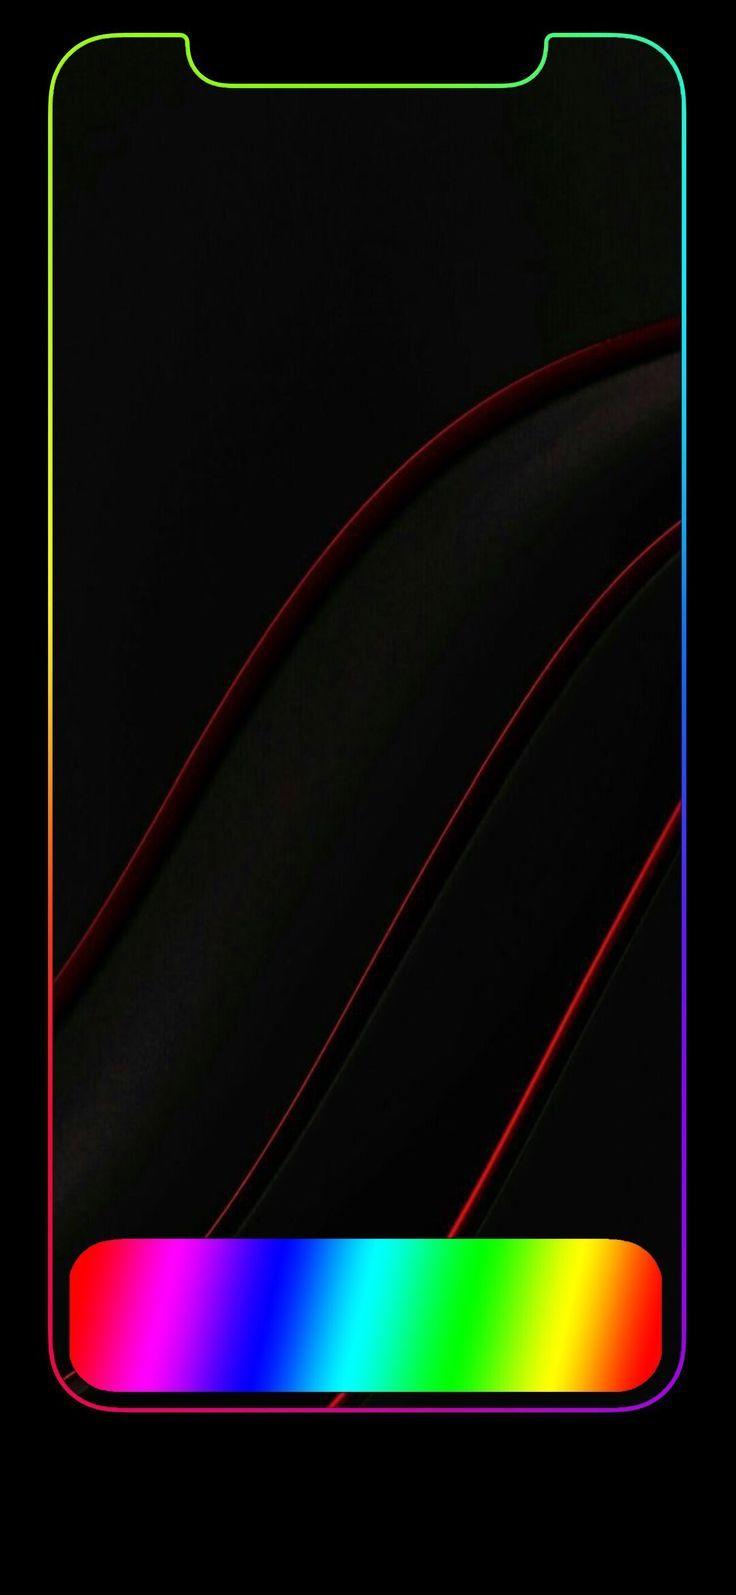 Iphone X Wallpaper 458733912039576164 Iphone X Wallpaper